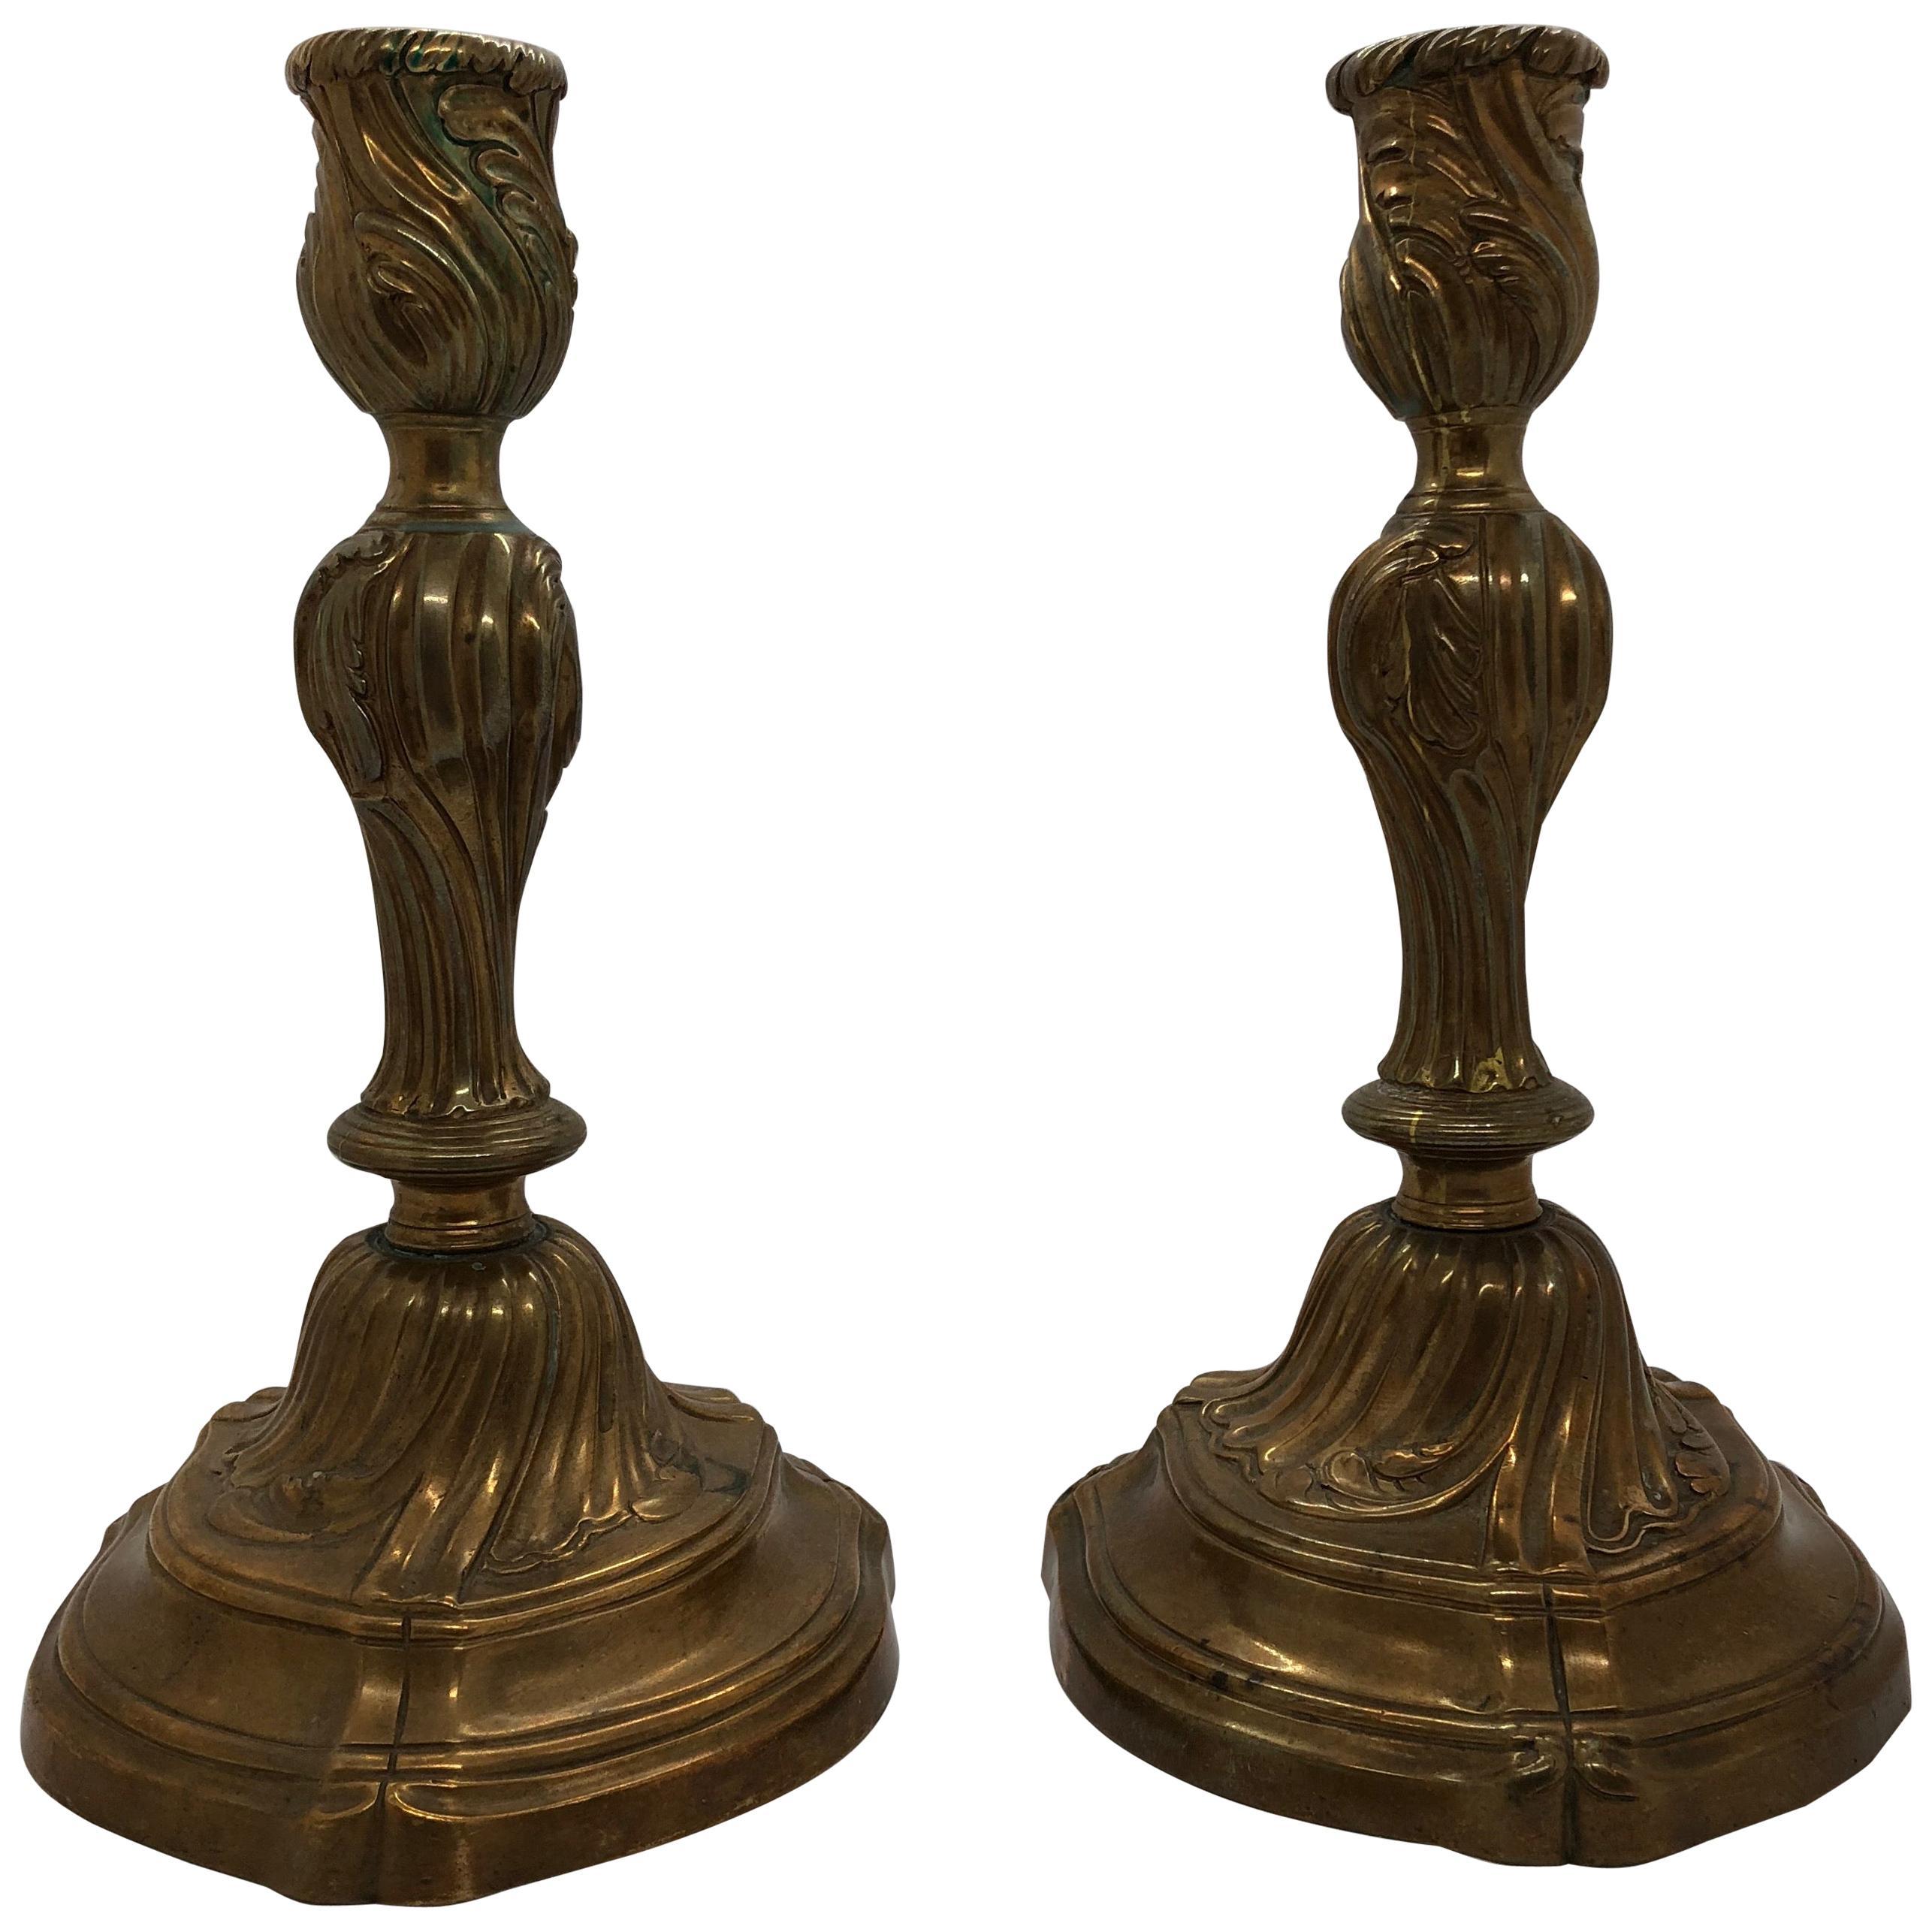 Pair of Rococo Candlesticks, 18th Century